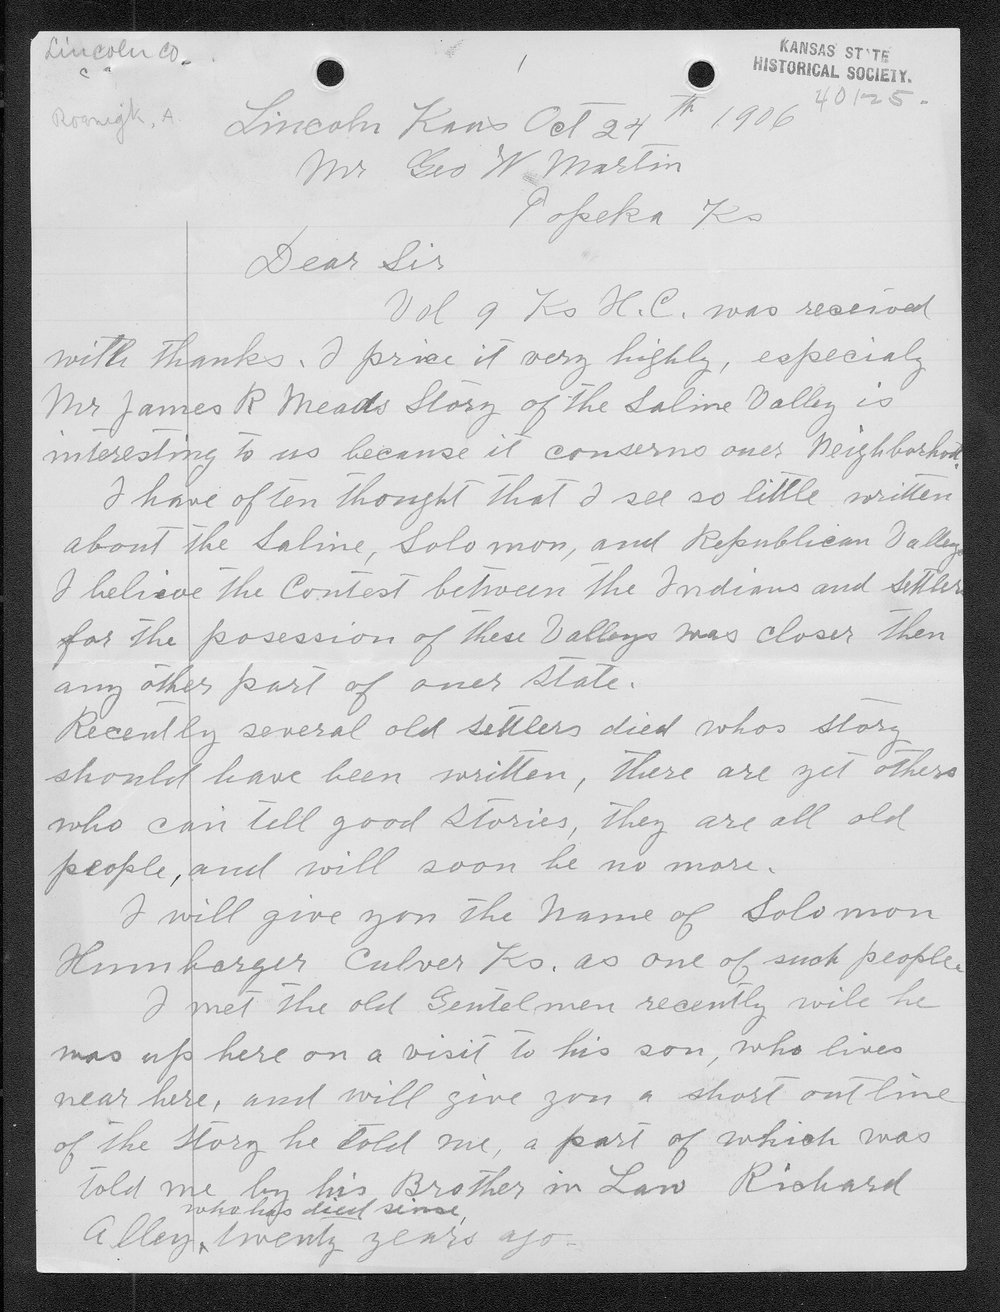 Adolph Roenigk and George W. Martin correspondence - 8